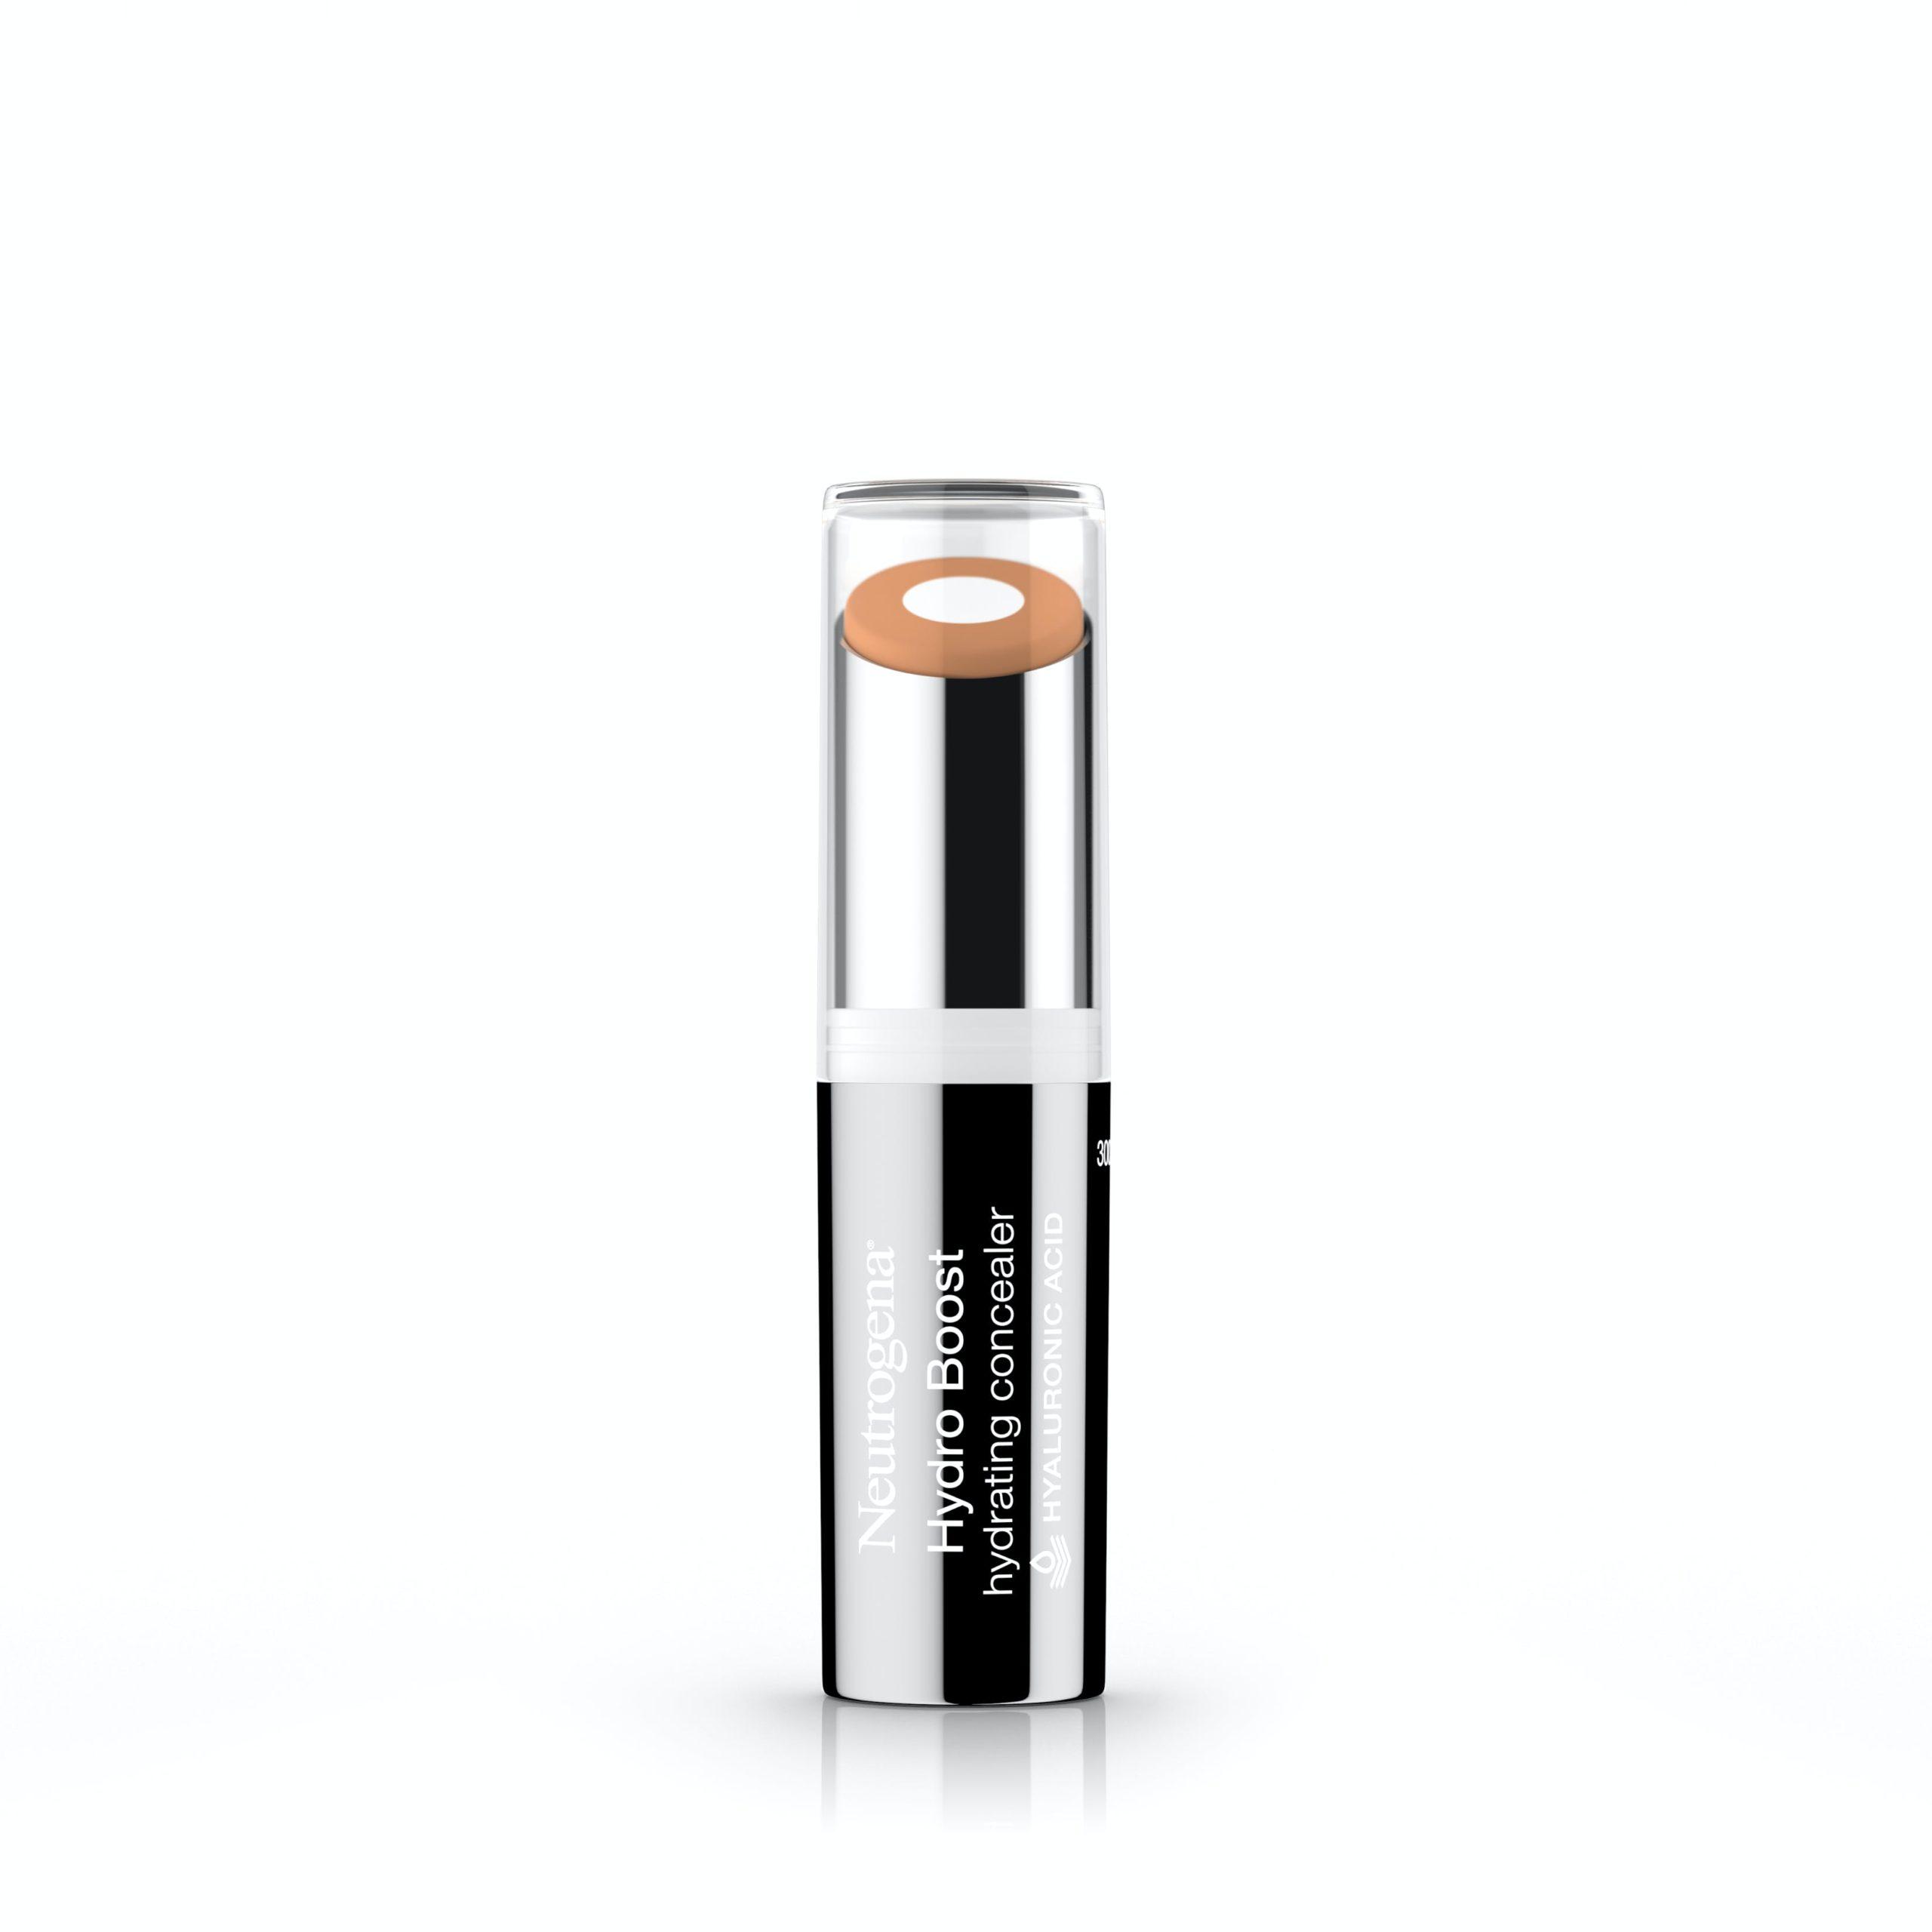 Hydro Boost Hydrating Concealer - Light Medium